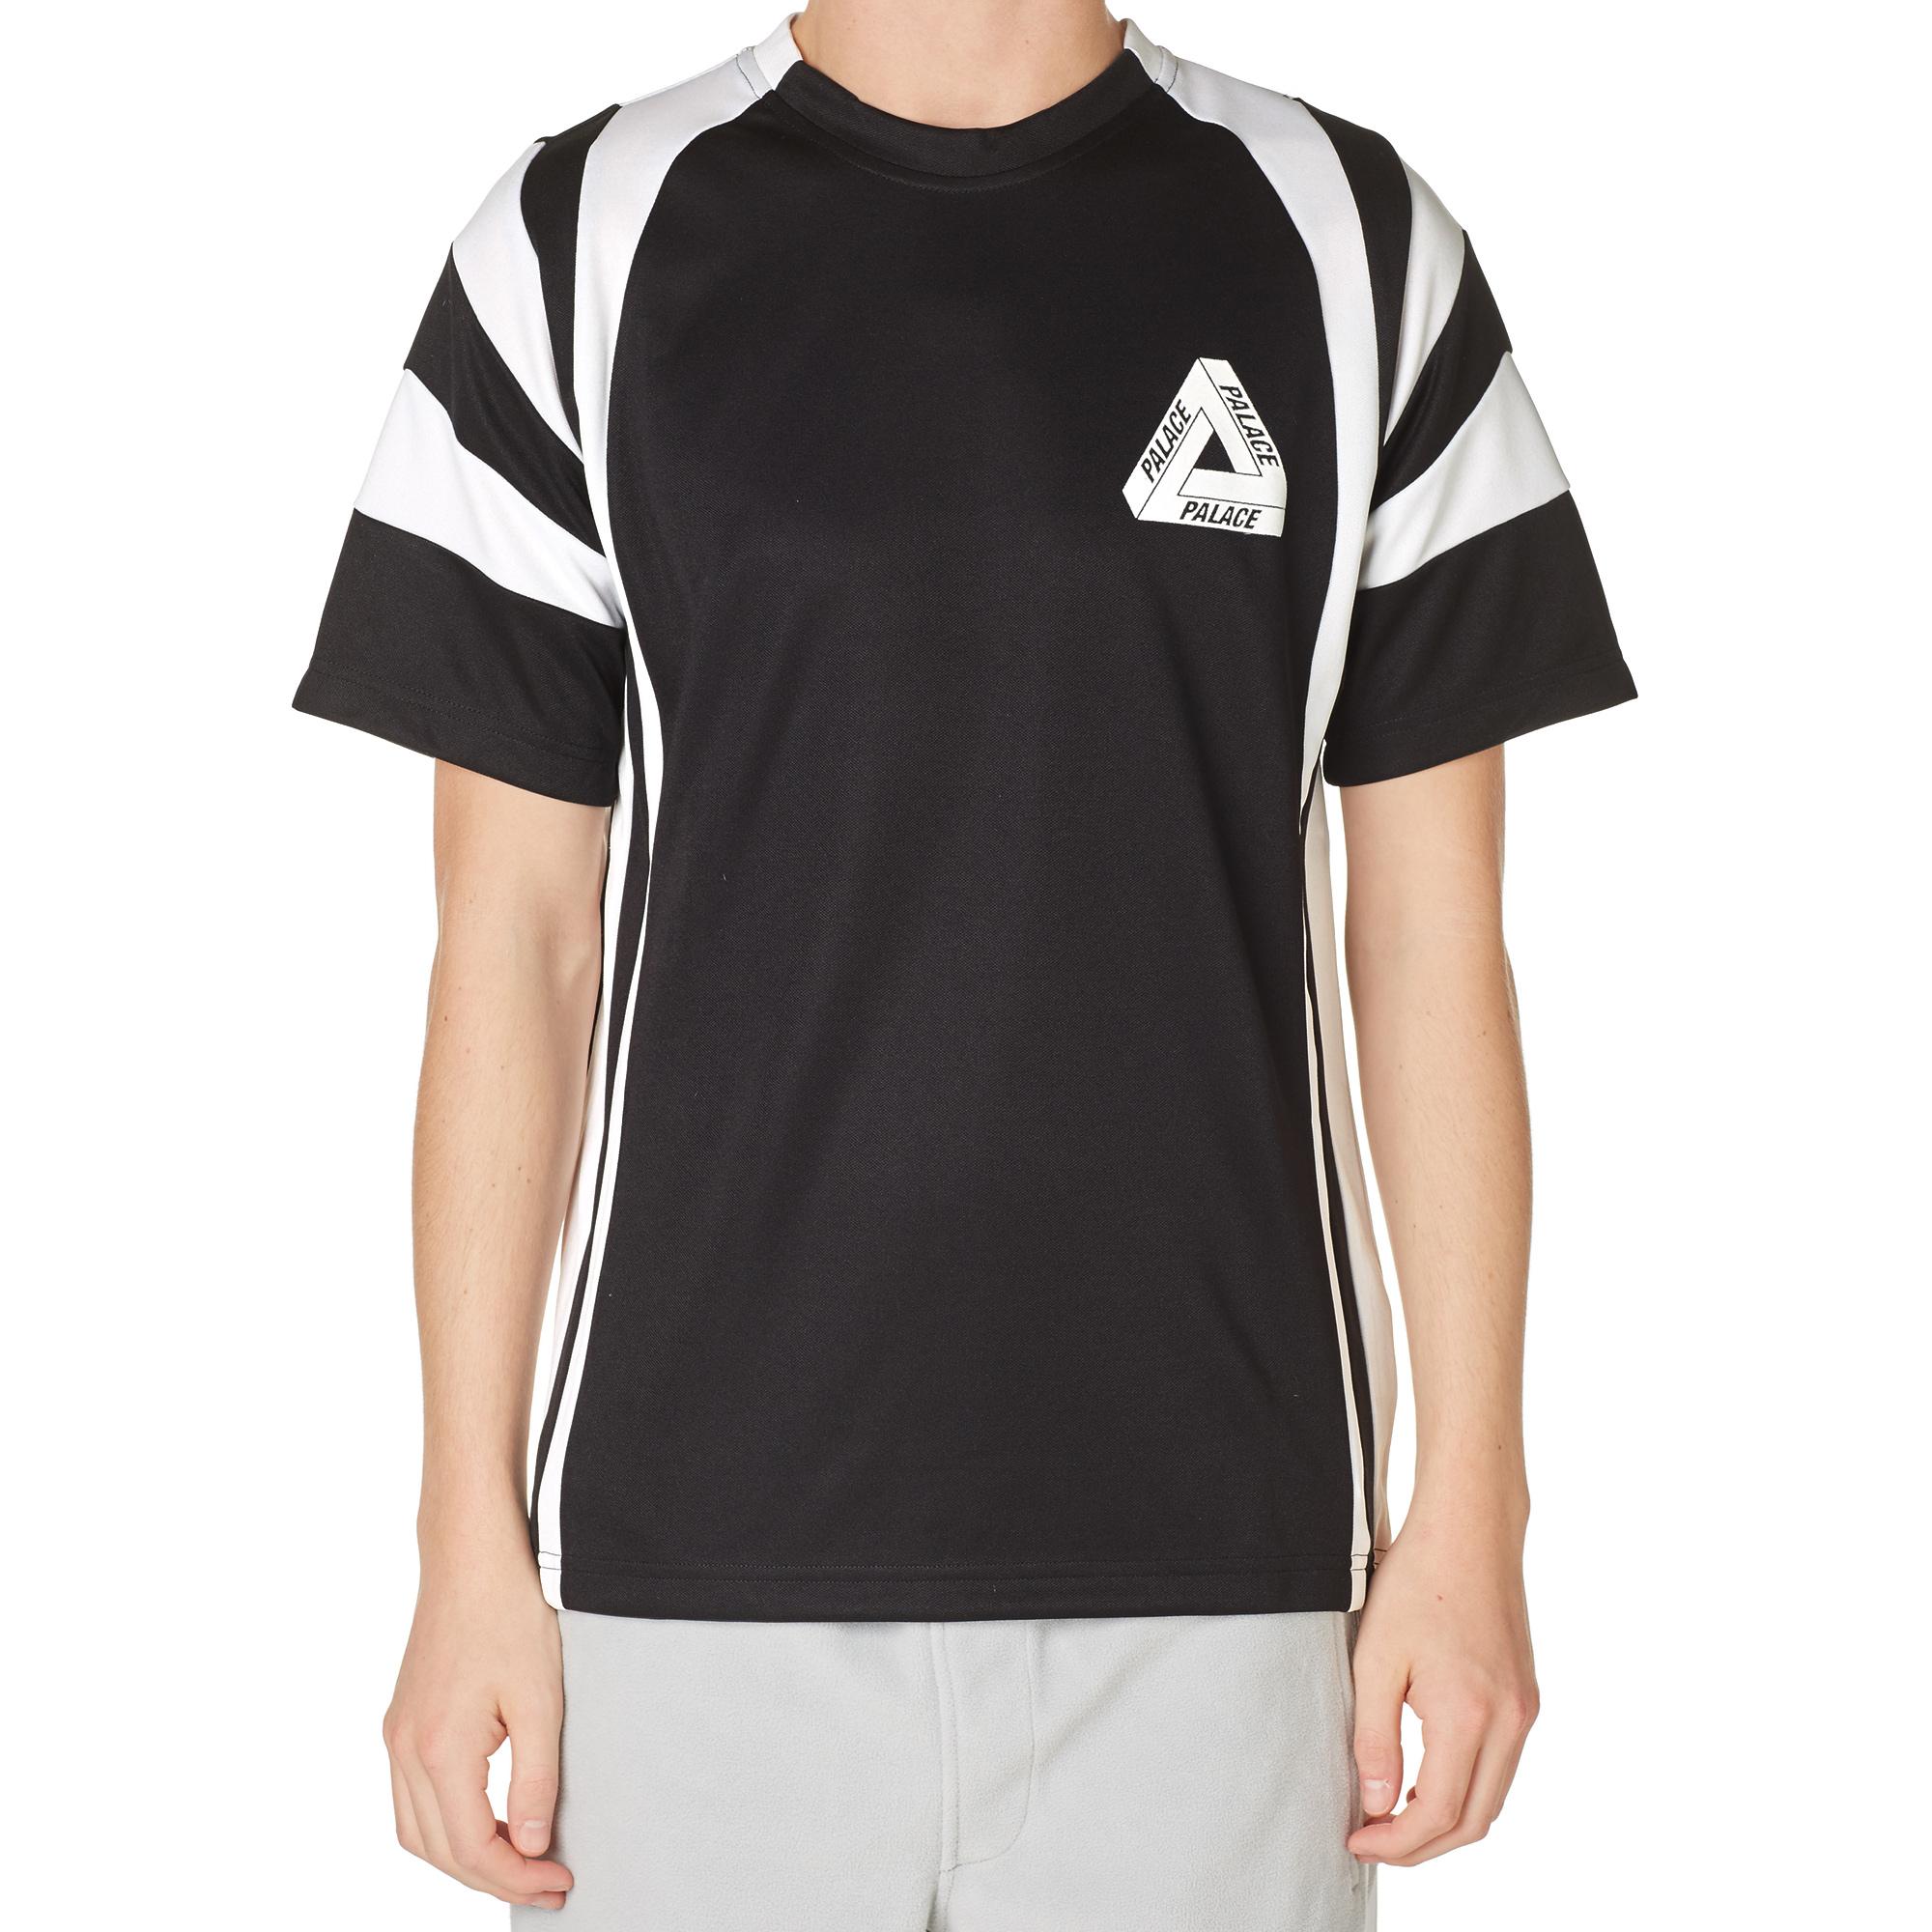 Adidas X Palace Graphic Tee Black